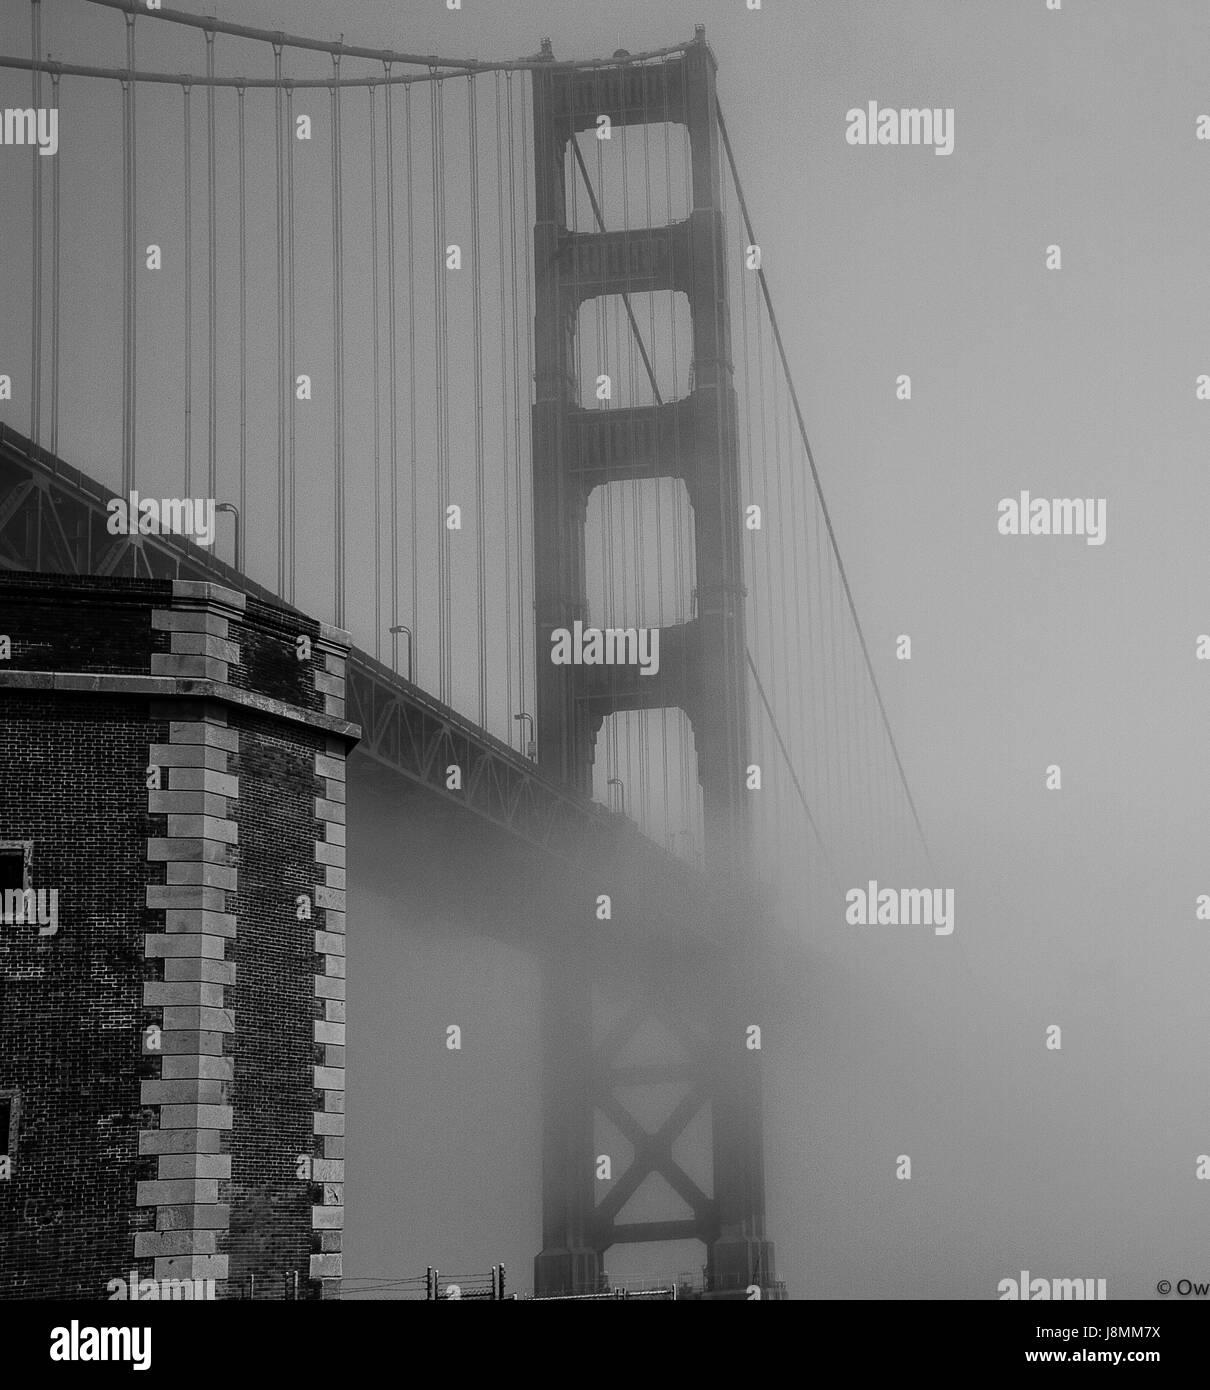 Golden Gate Bridge - San Francisco, California Stock Photo